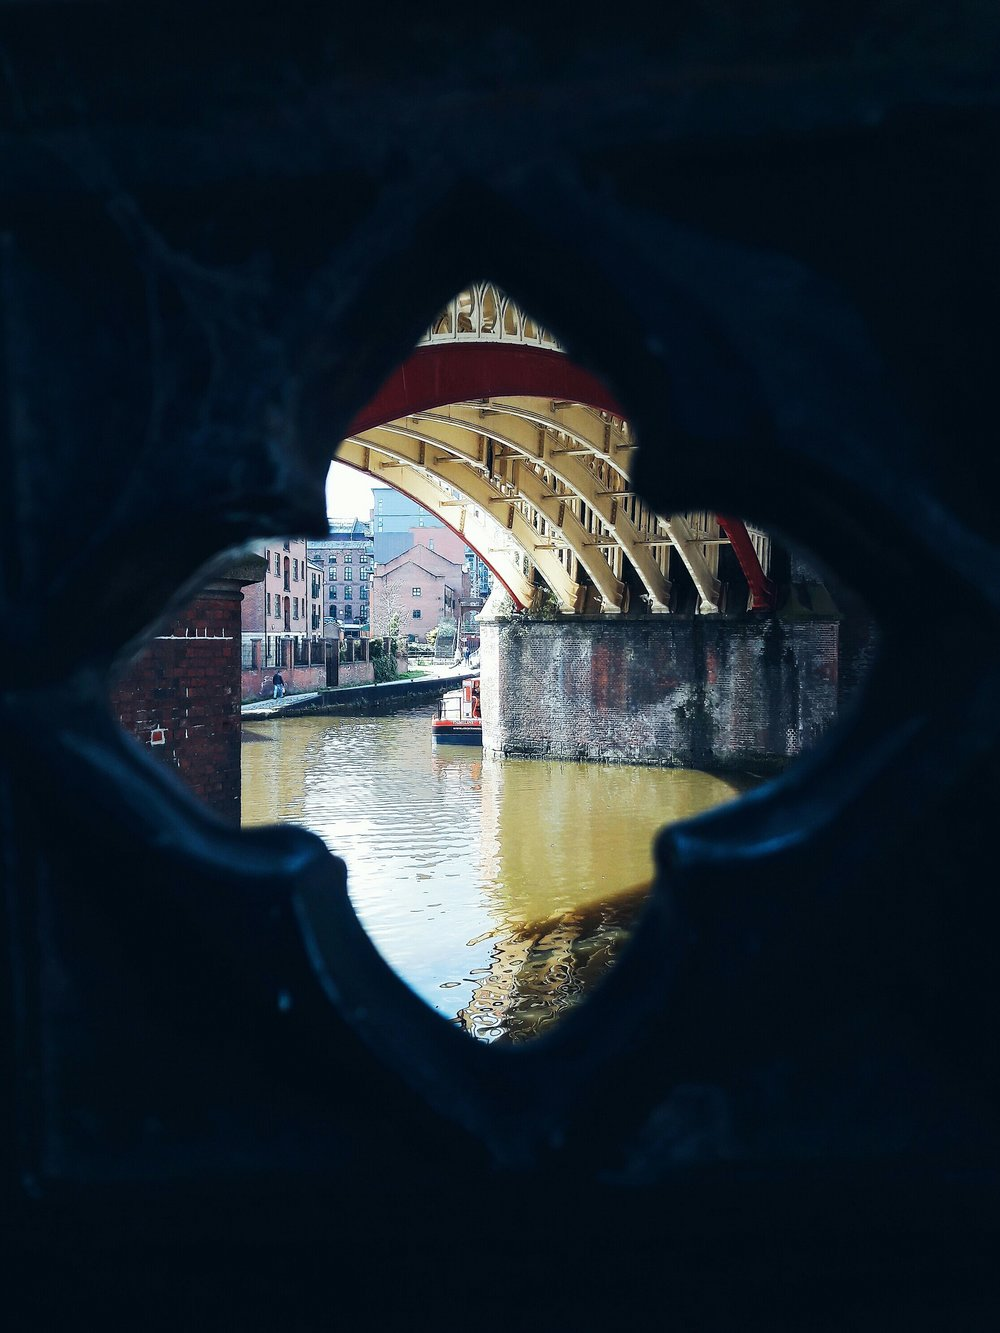 Castlefield Bridge, Manchester